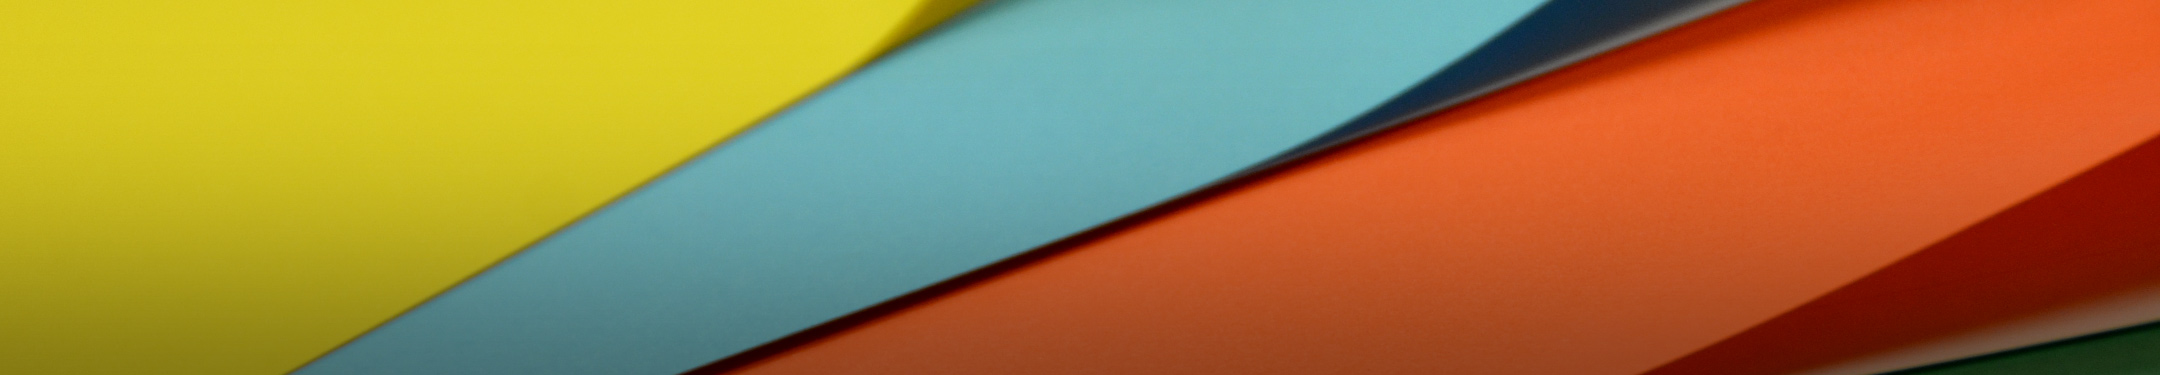 Starliner Colors